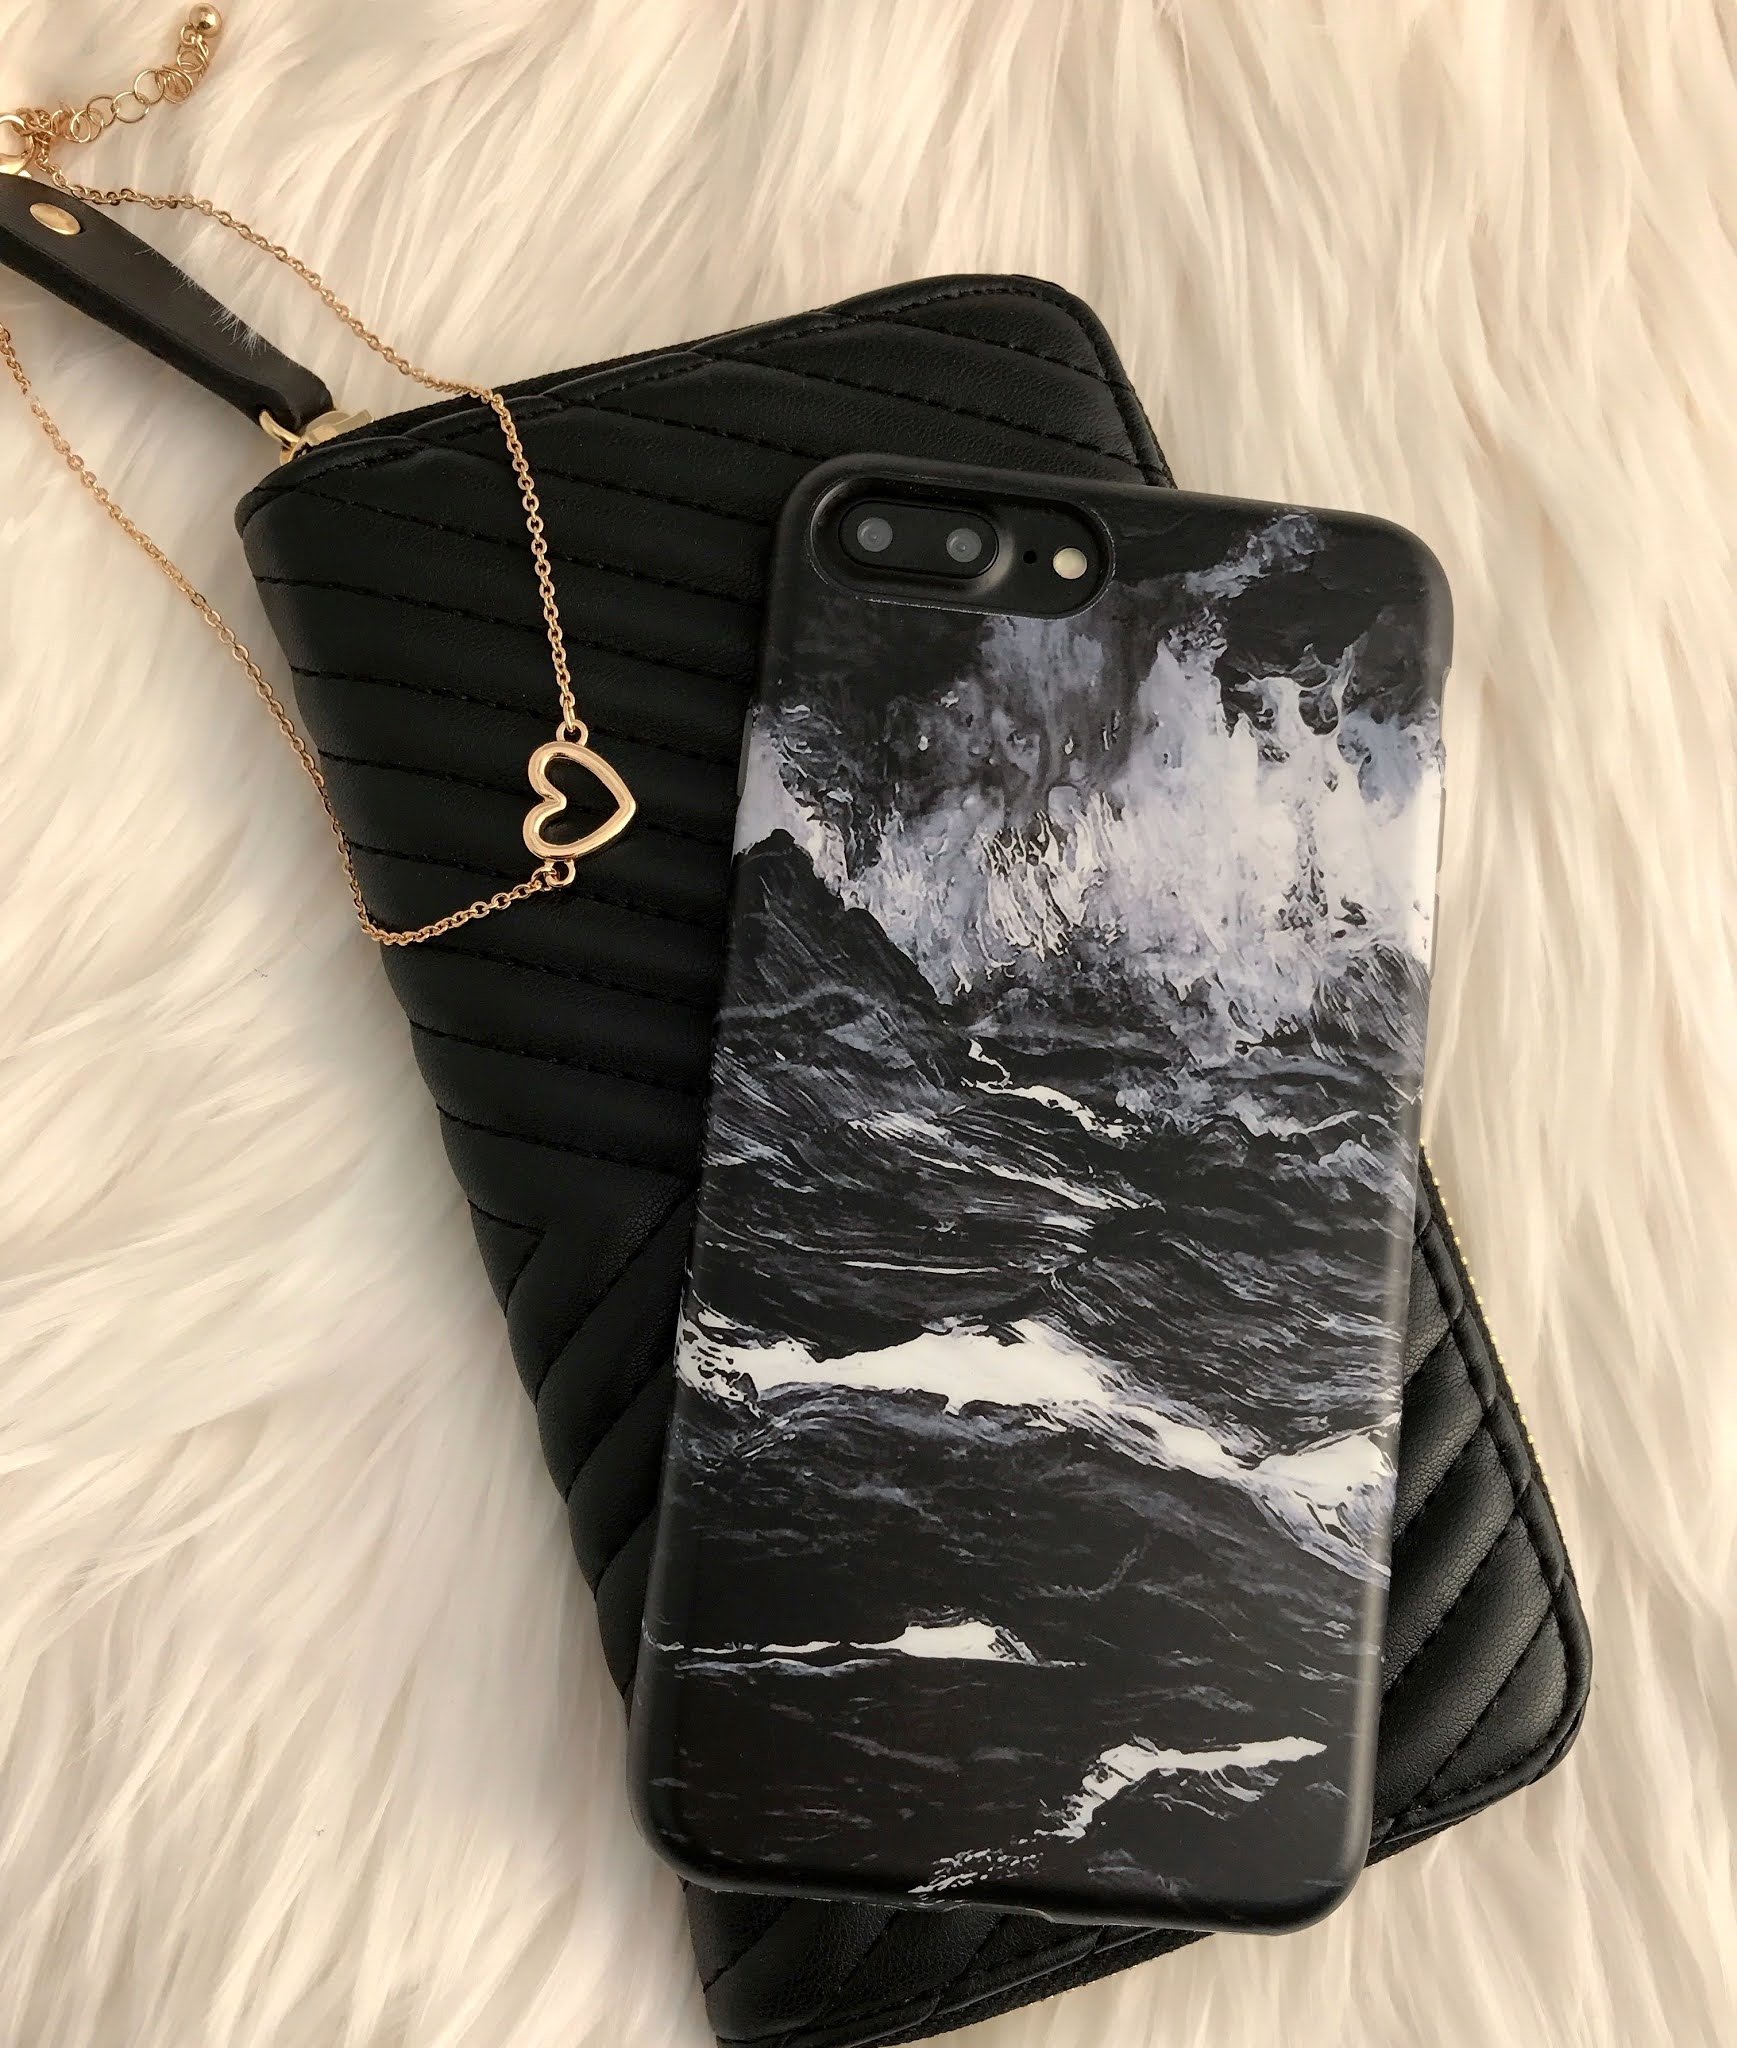 casing marble hitam